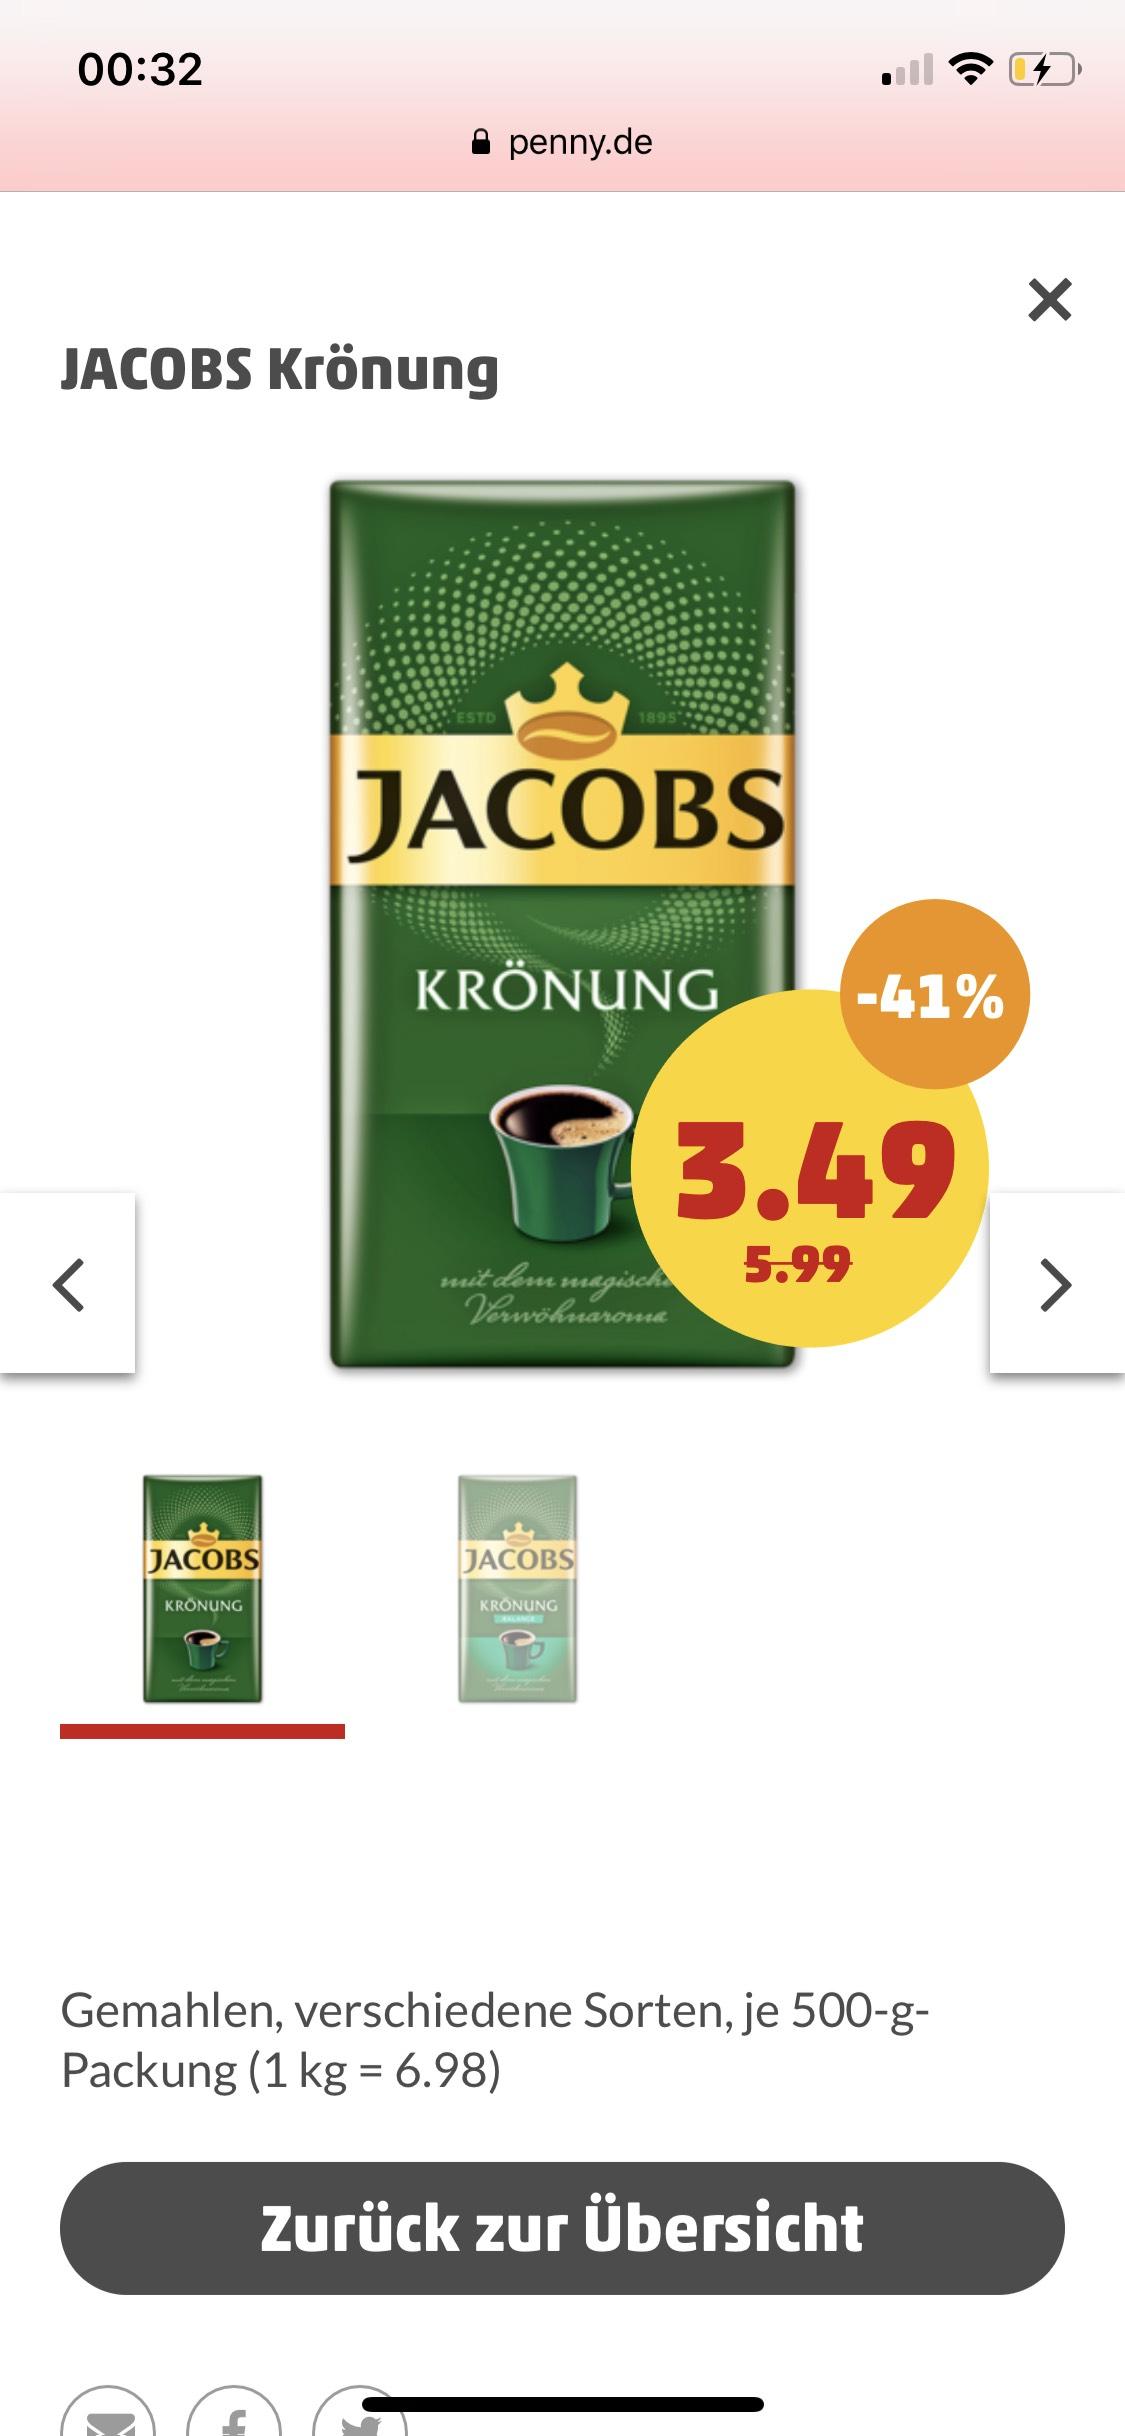 Jacobs Krönung Kaffee 500g Packung // Penny-Markt